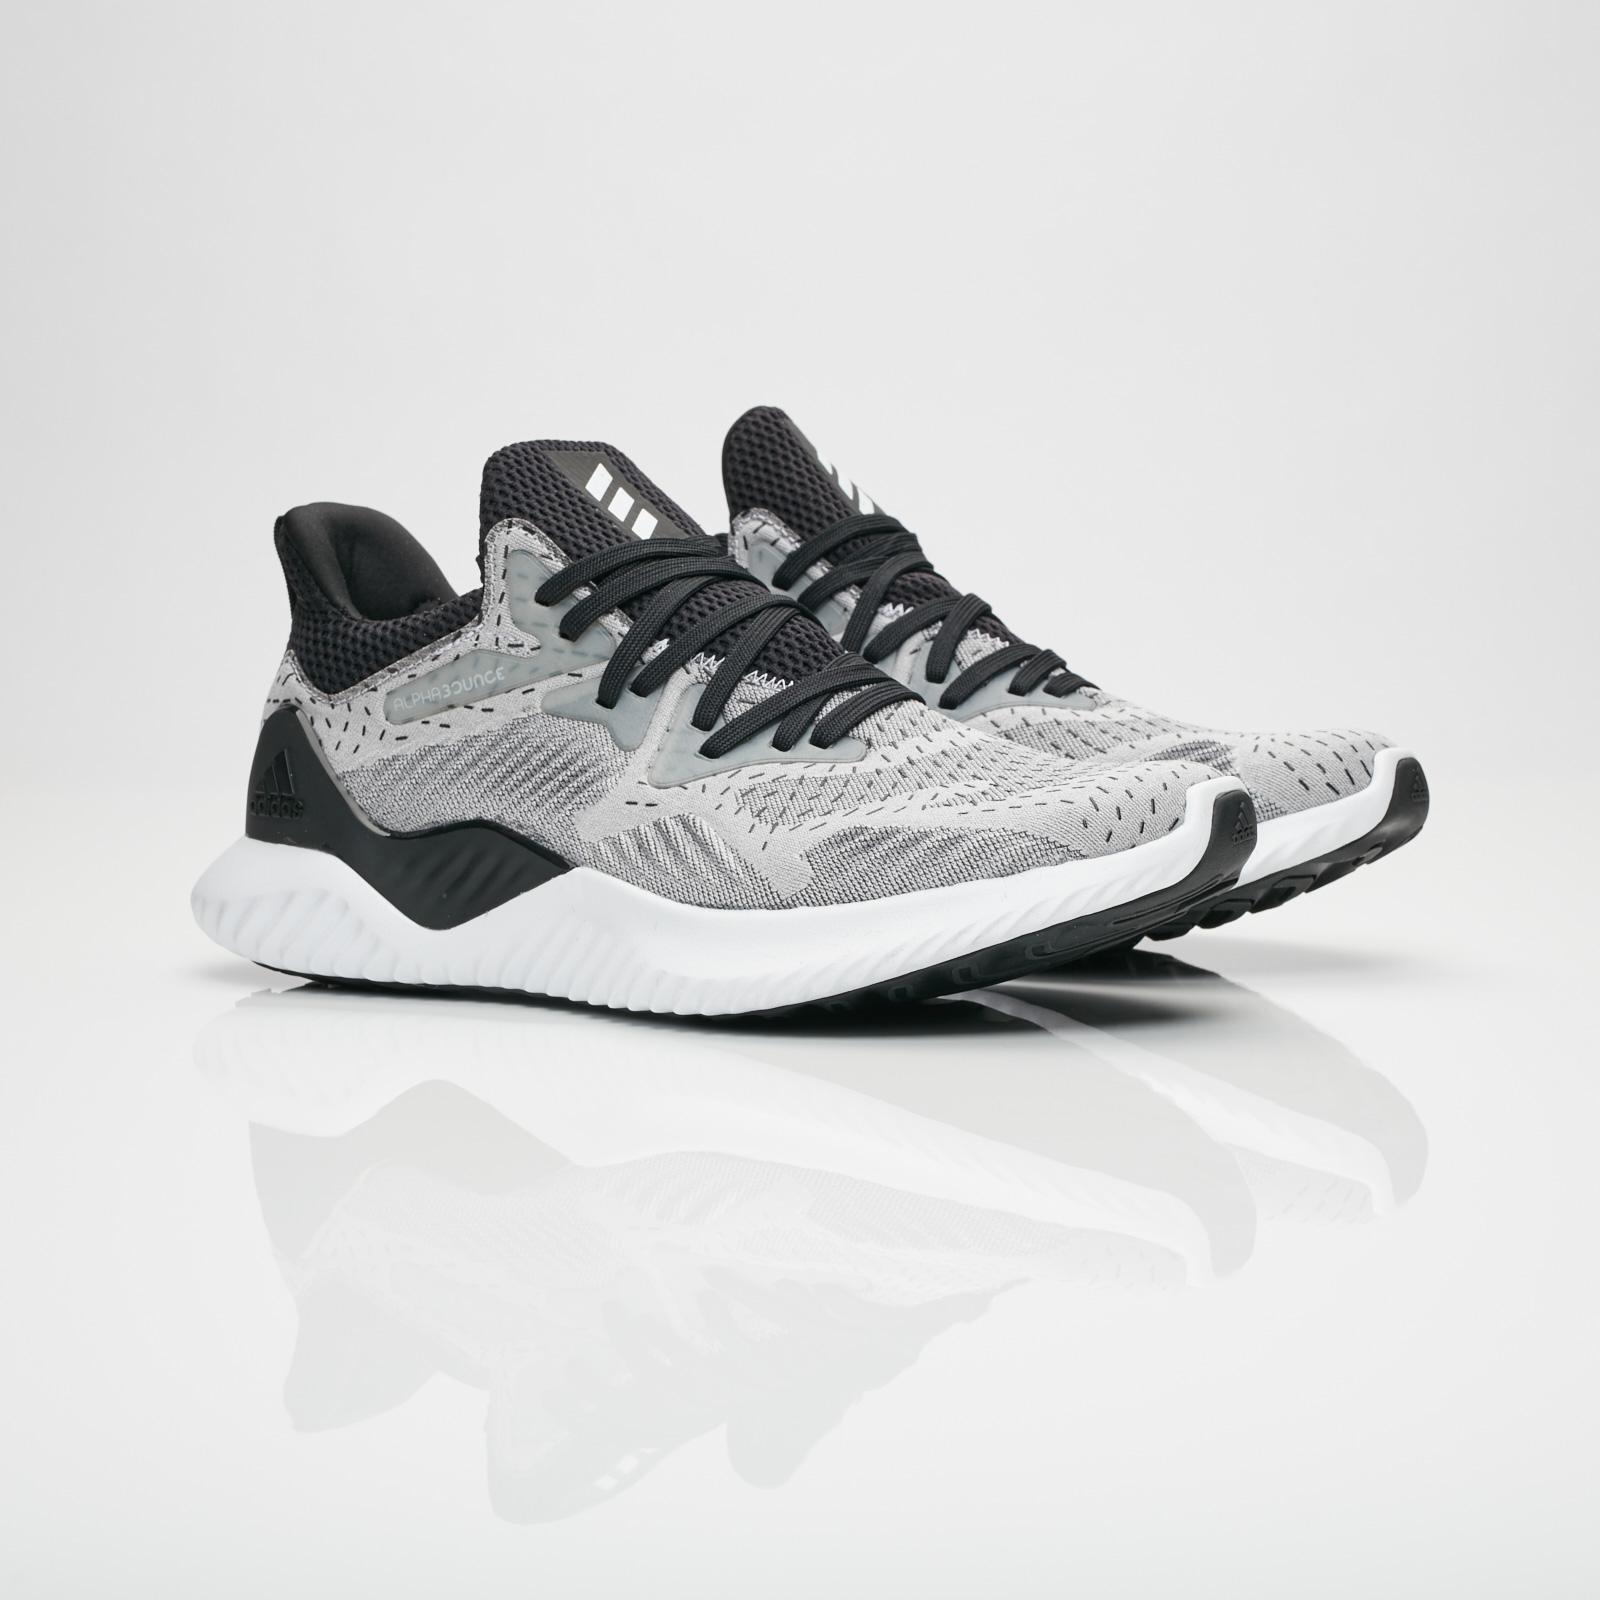 0c41347f03ea0 adidas Alphabounce Beyond M - Db1126 - Sneakersnstuff